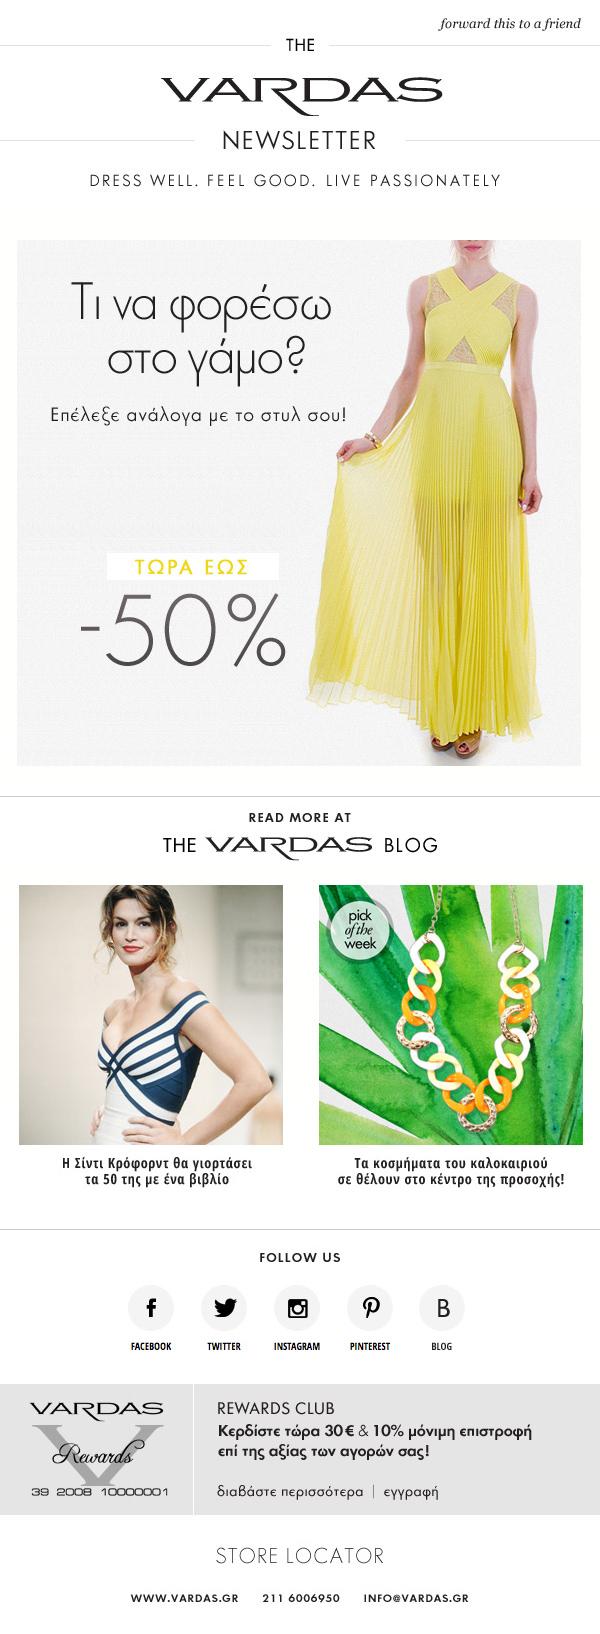 Vardas SA - Summer Newsletter